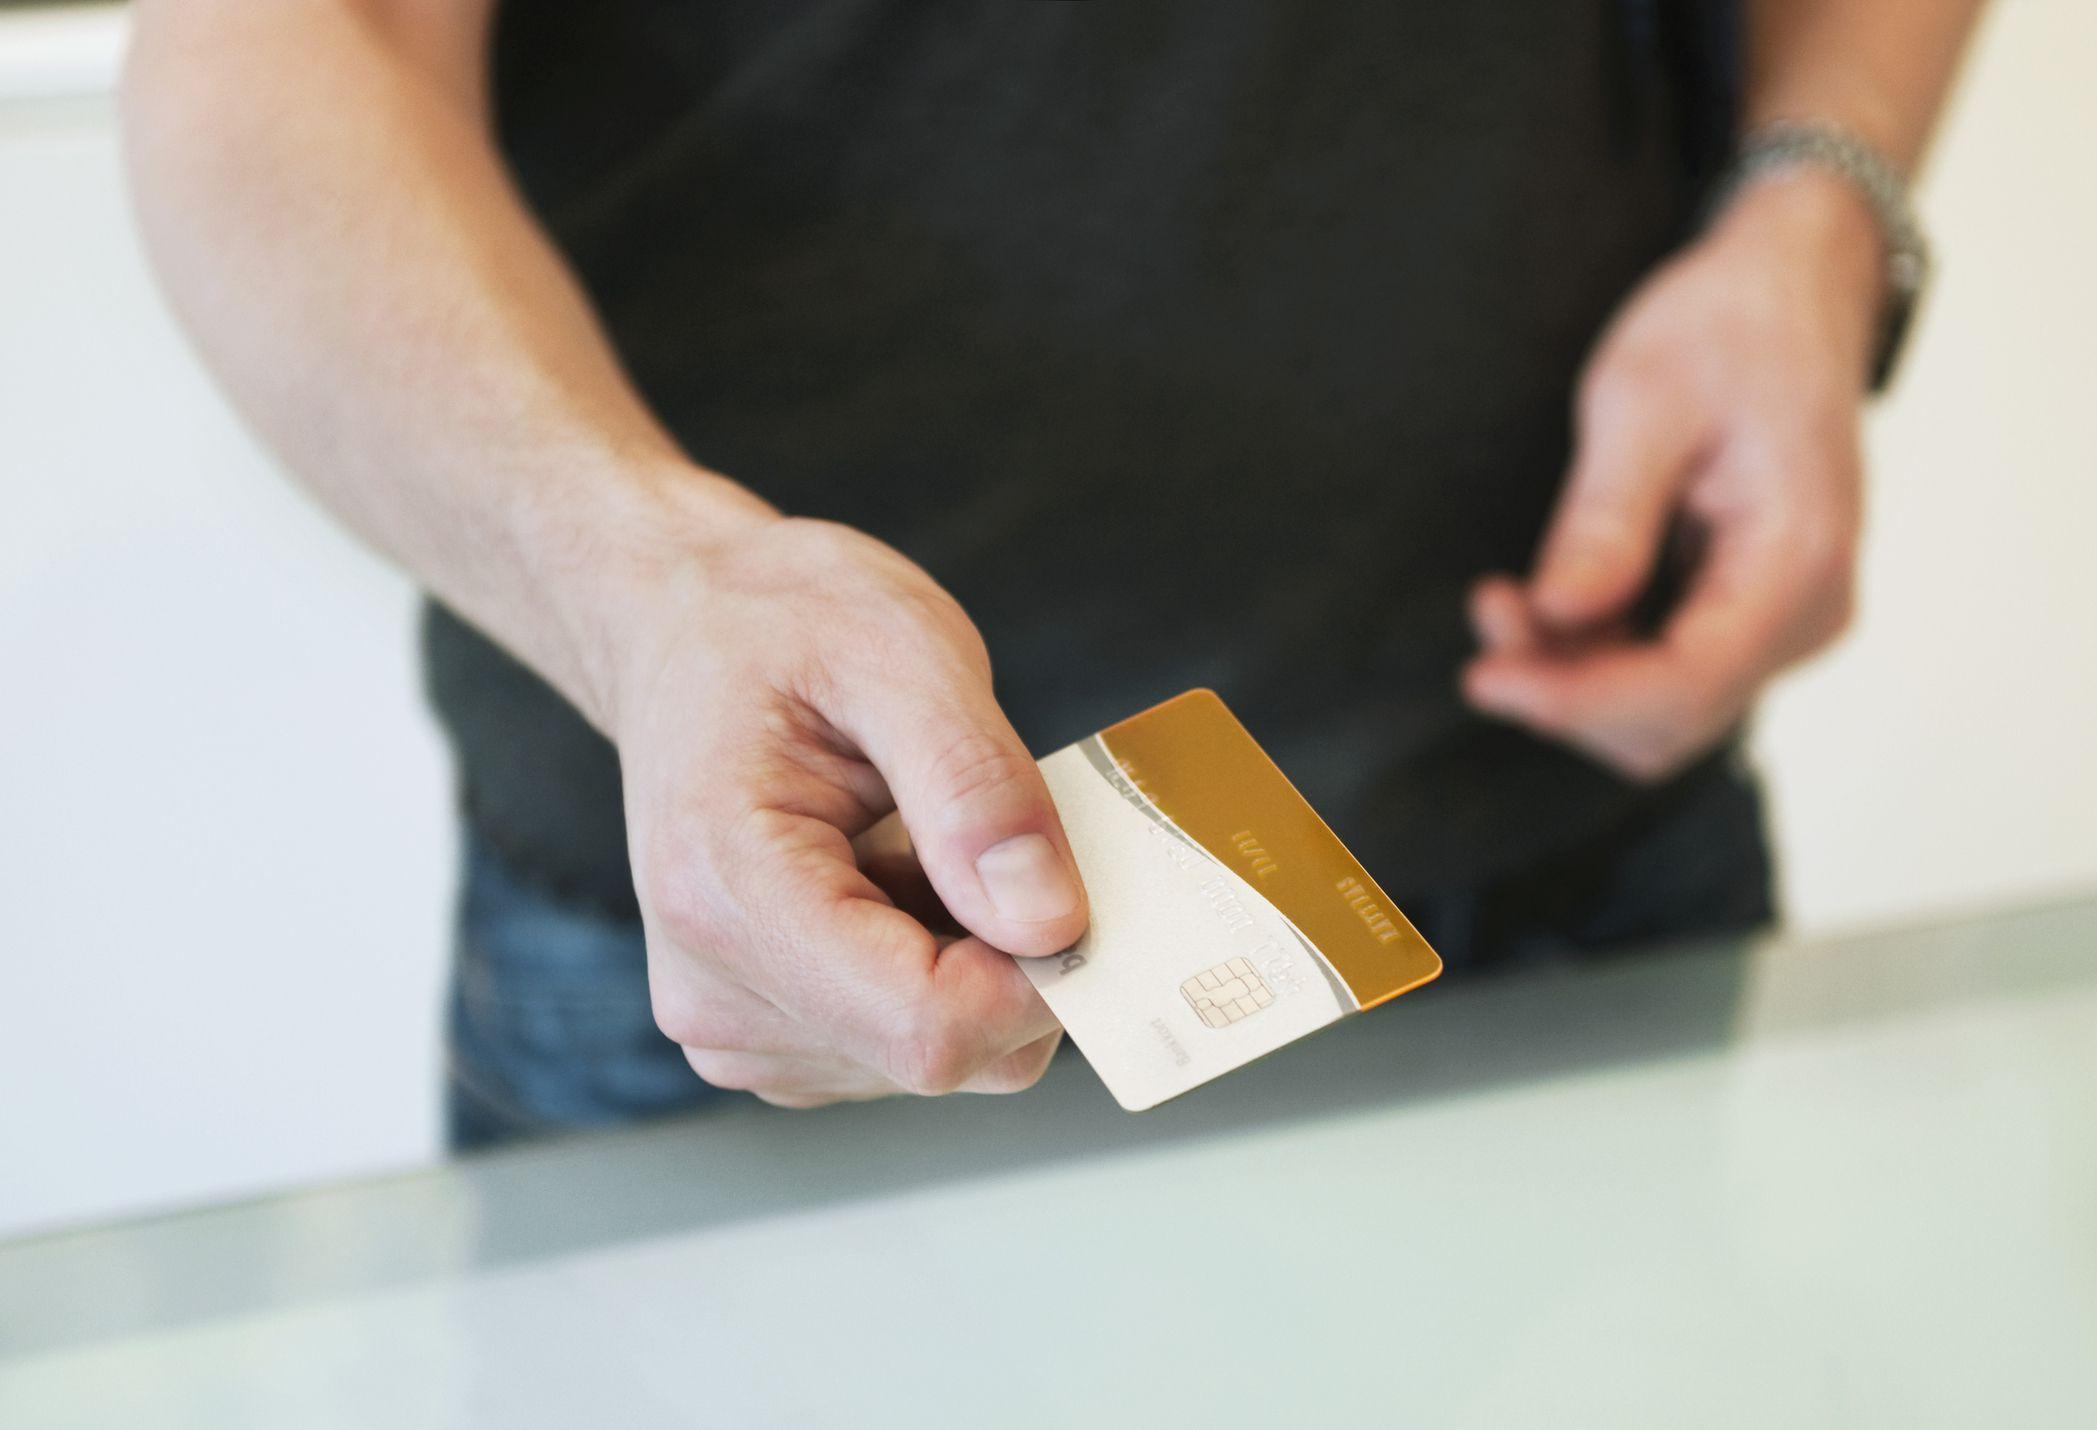 Man Using Credit Card